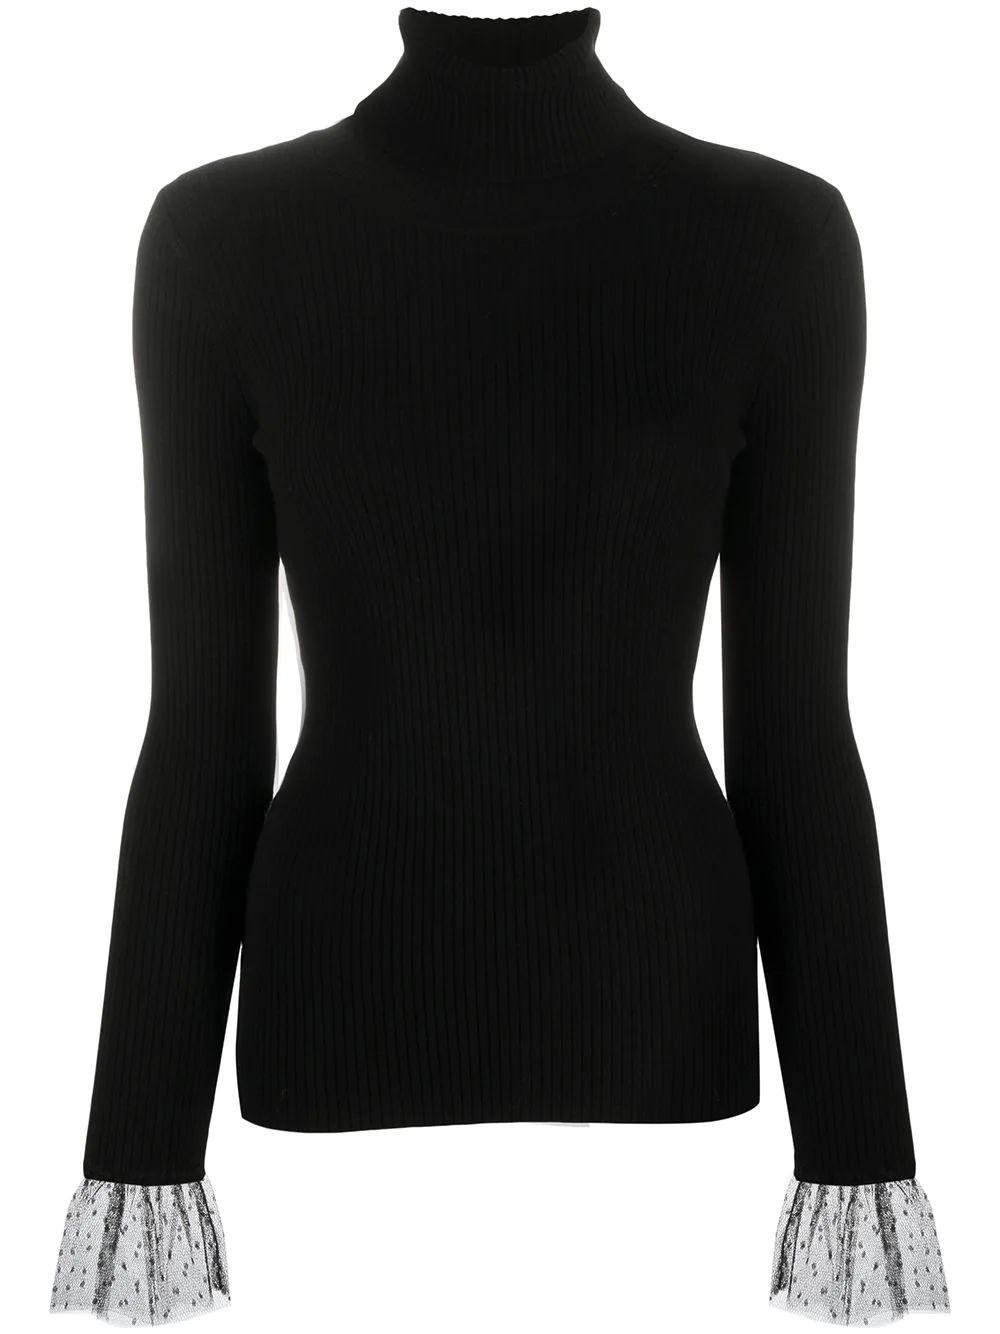 Turtleneck Sweater With Tulle Cuff Item # UR3KC01N58J